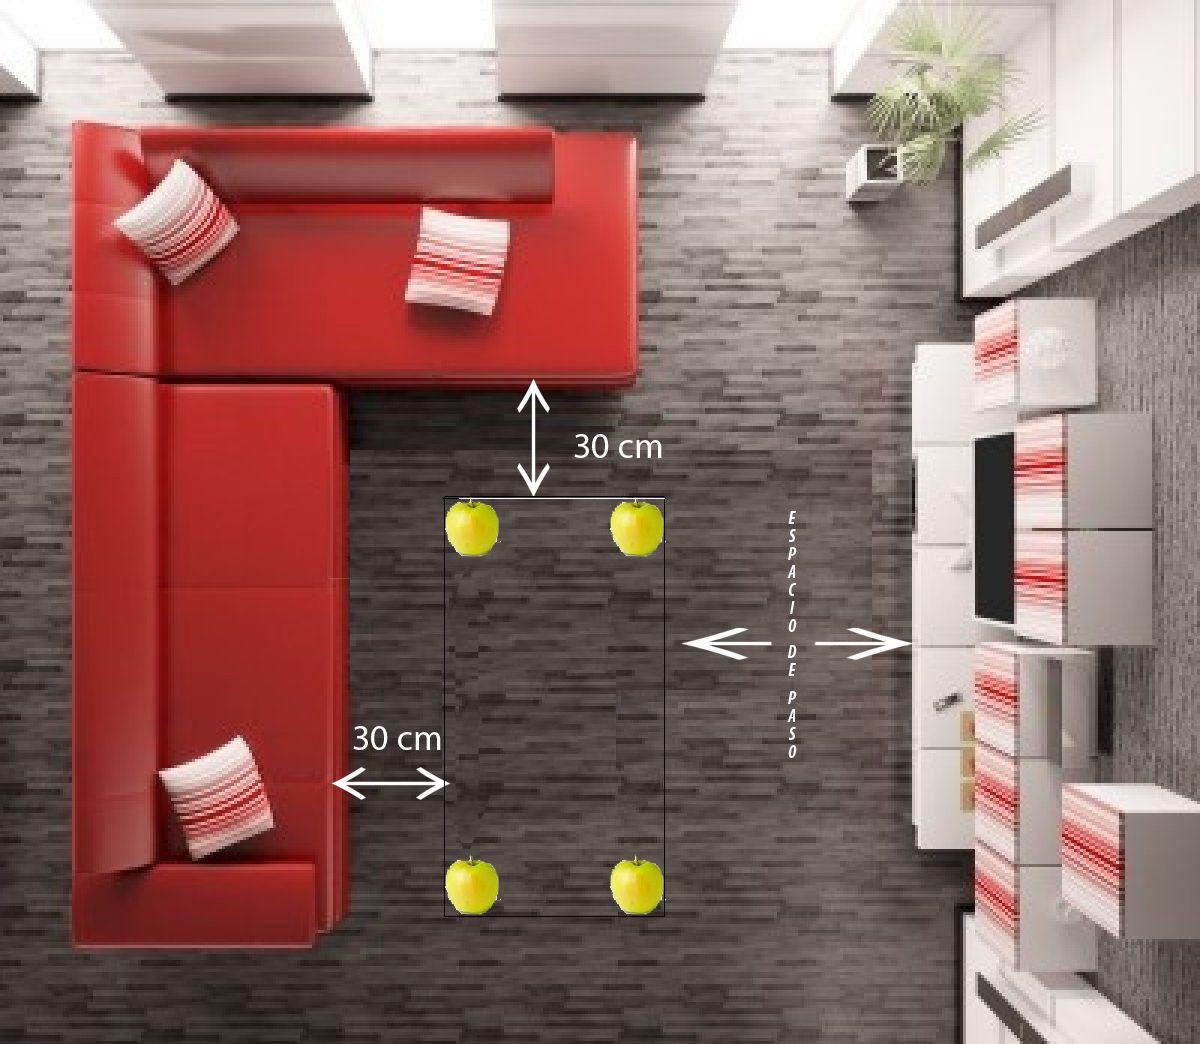 Mesa camilla rectangular - cómo calcular su tamaño ideal ...